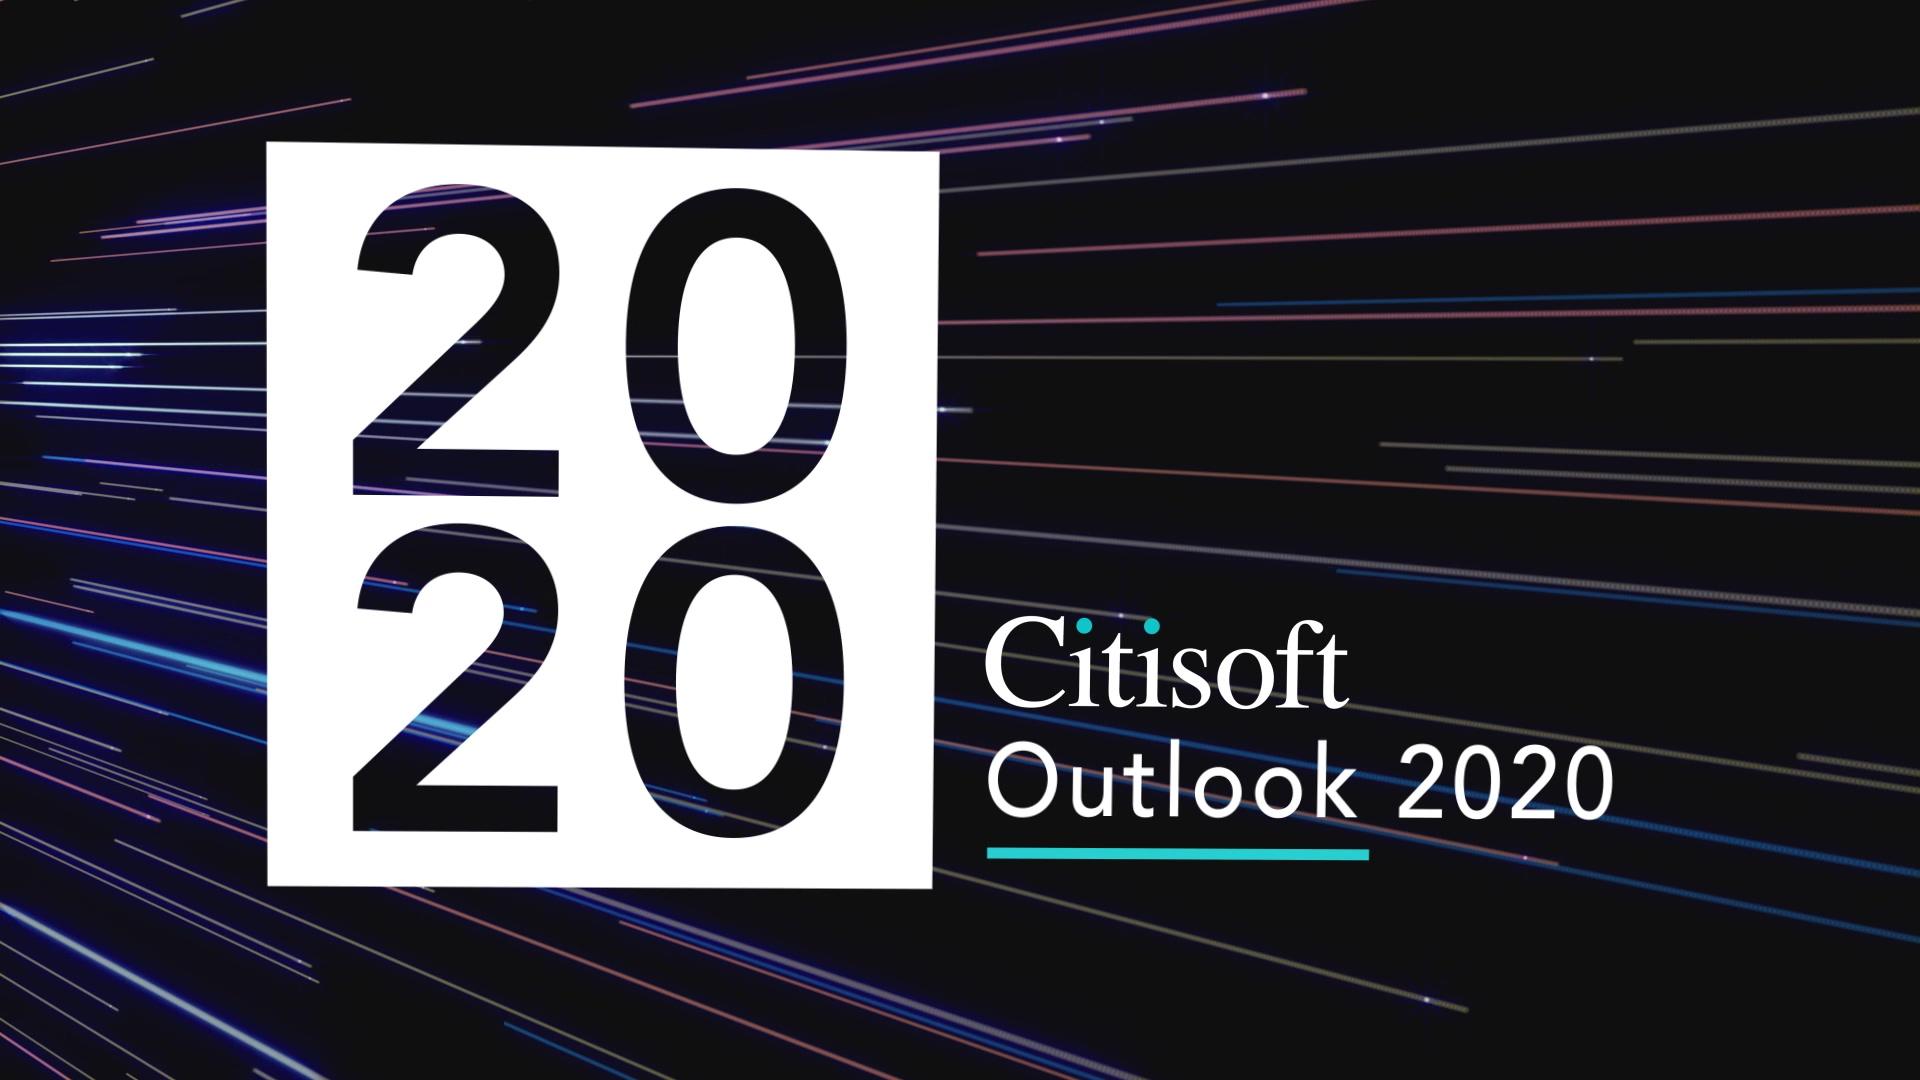 CitisoftOutlook2020_Highlights